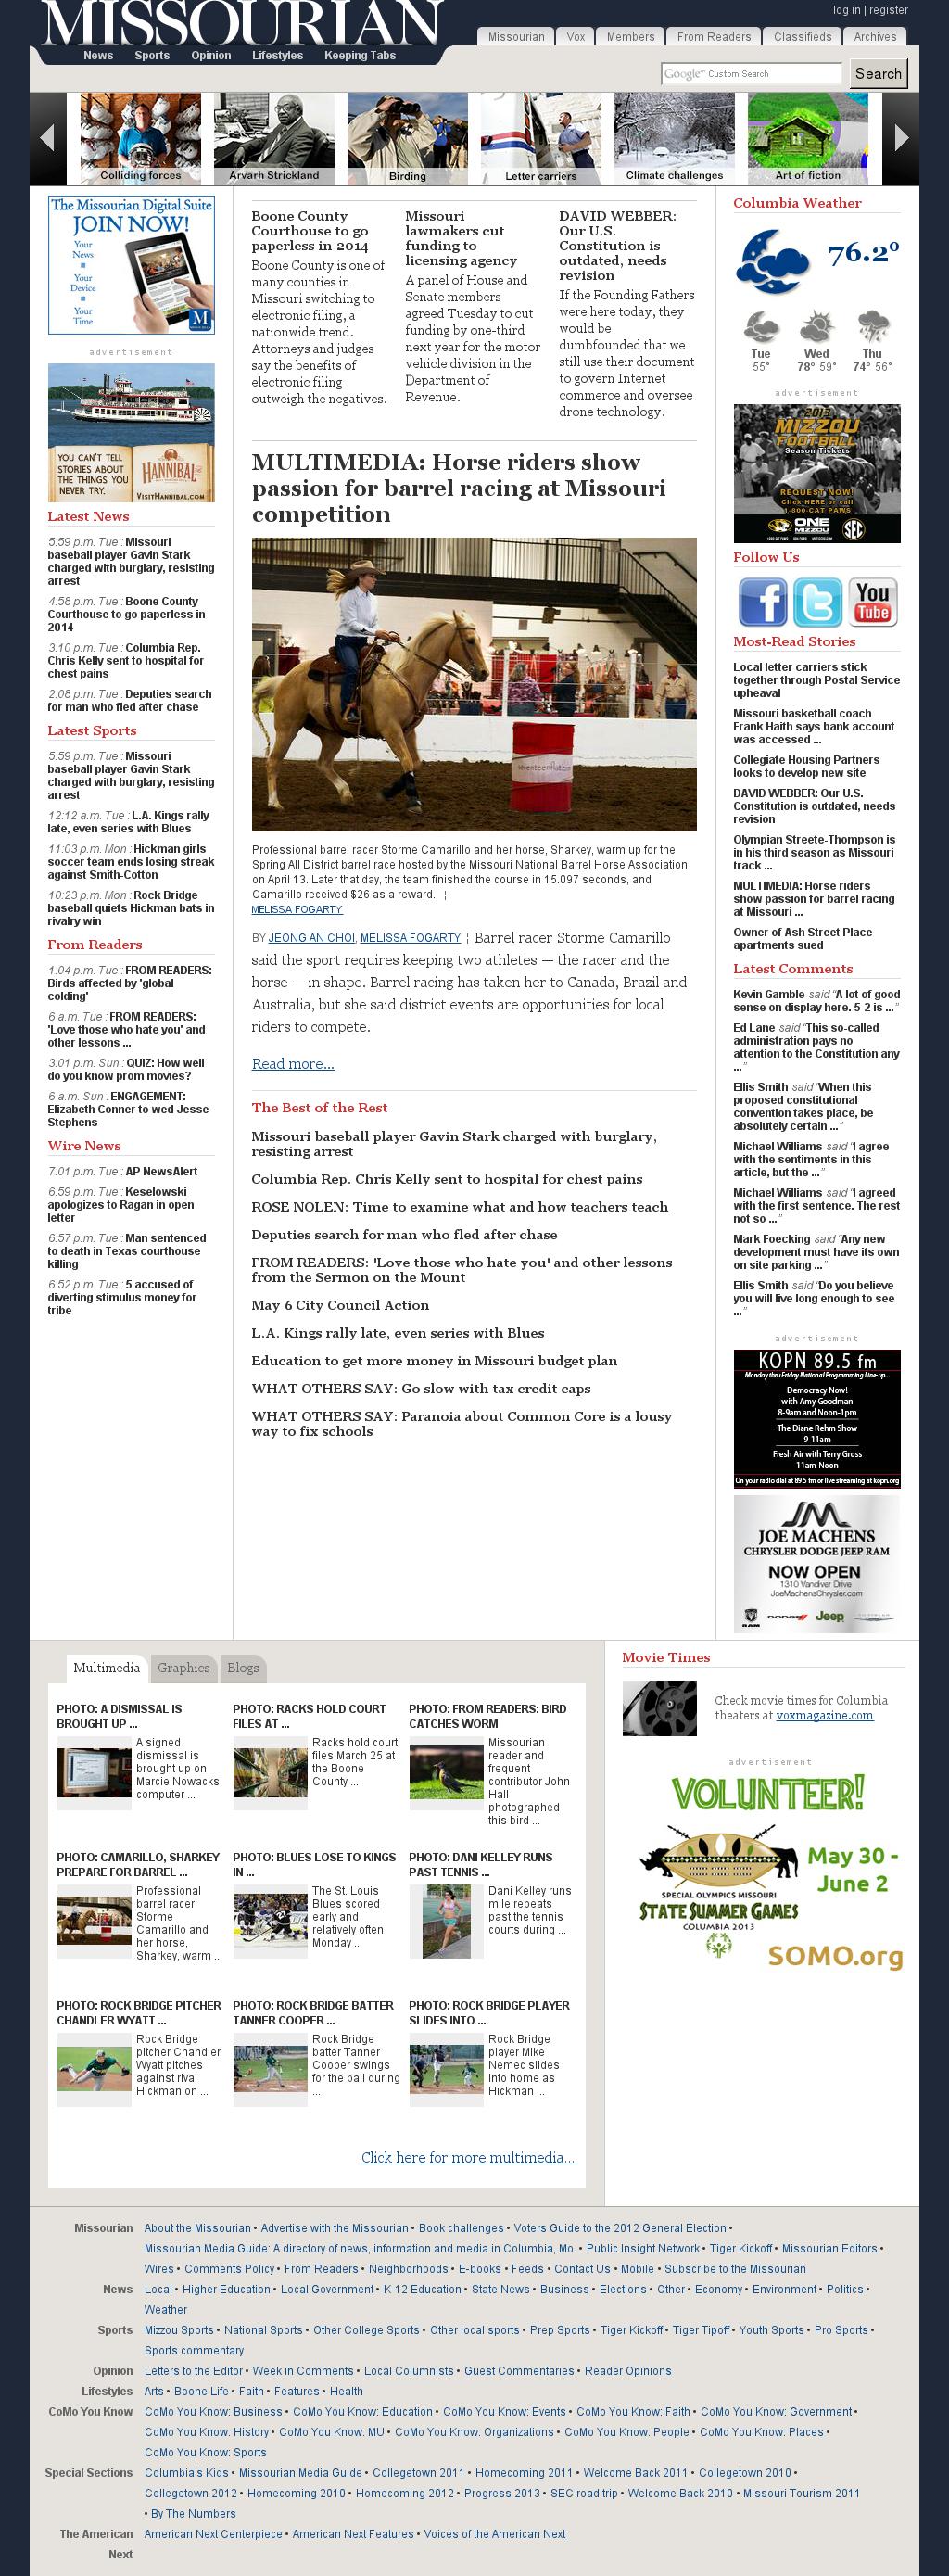 Columbia Missourian at Wednesday May 8, 2013, 12:06 a.m. UTC